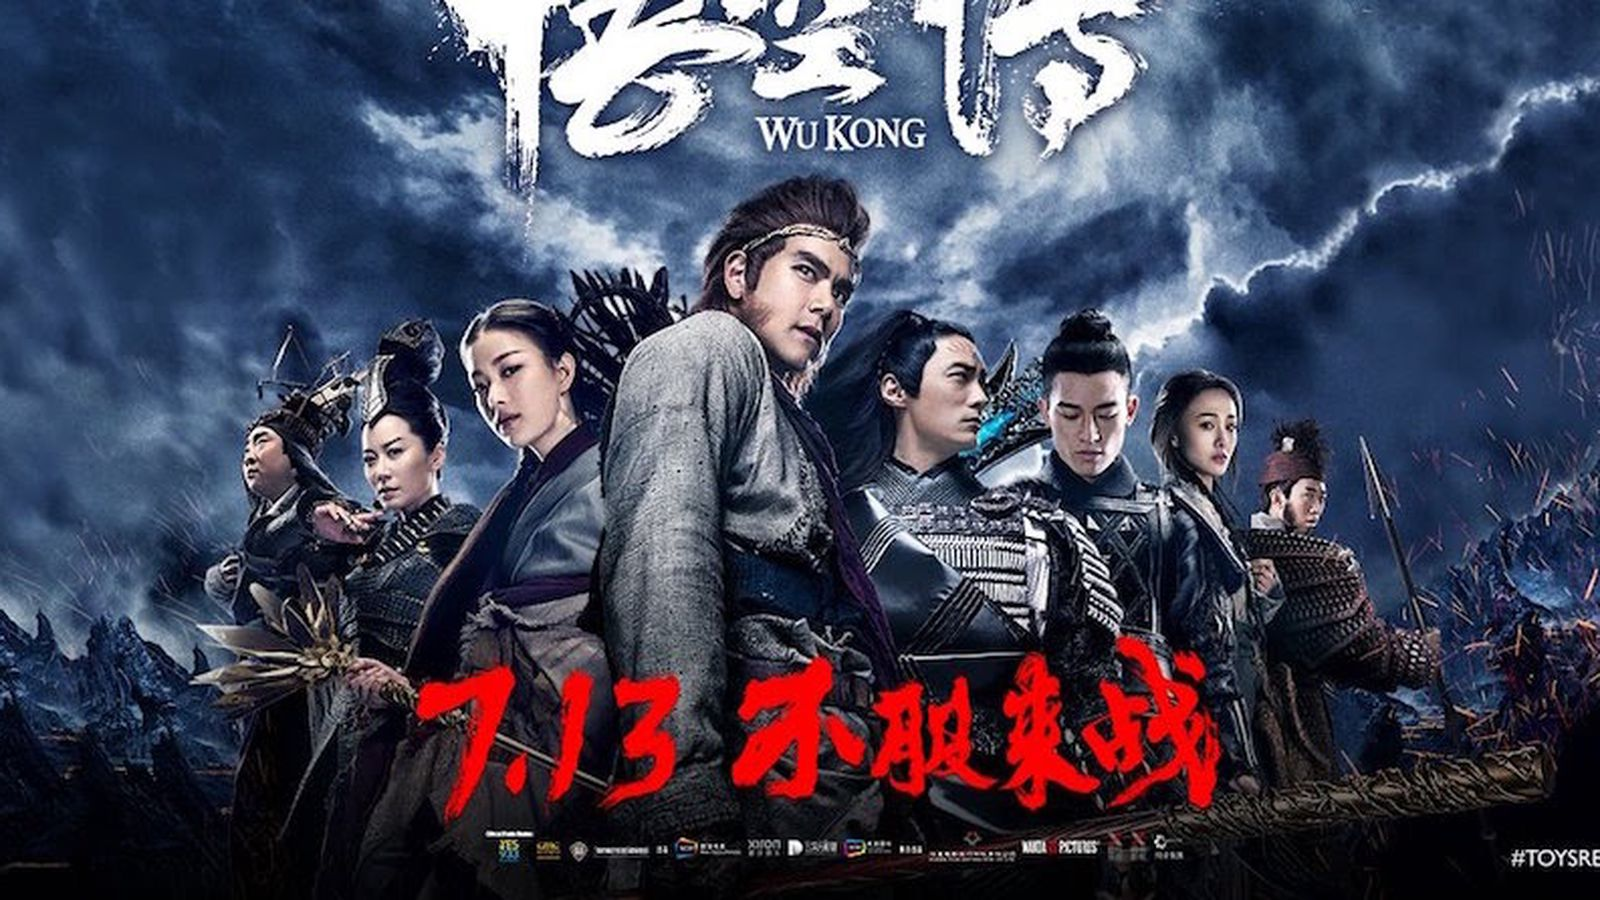 Wu Kong E F E A Ba E Bc A Poster